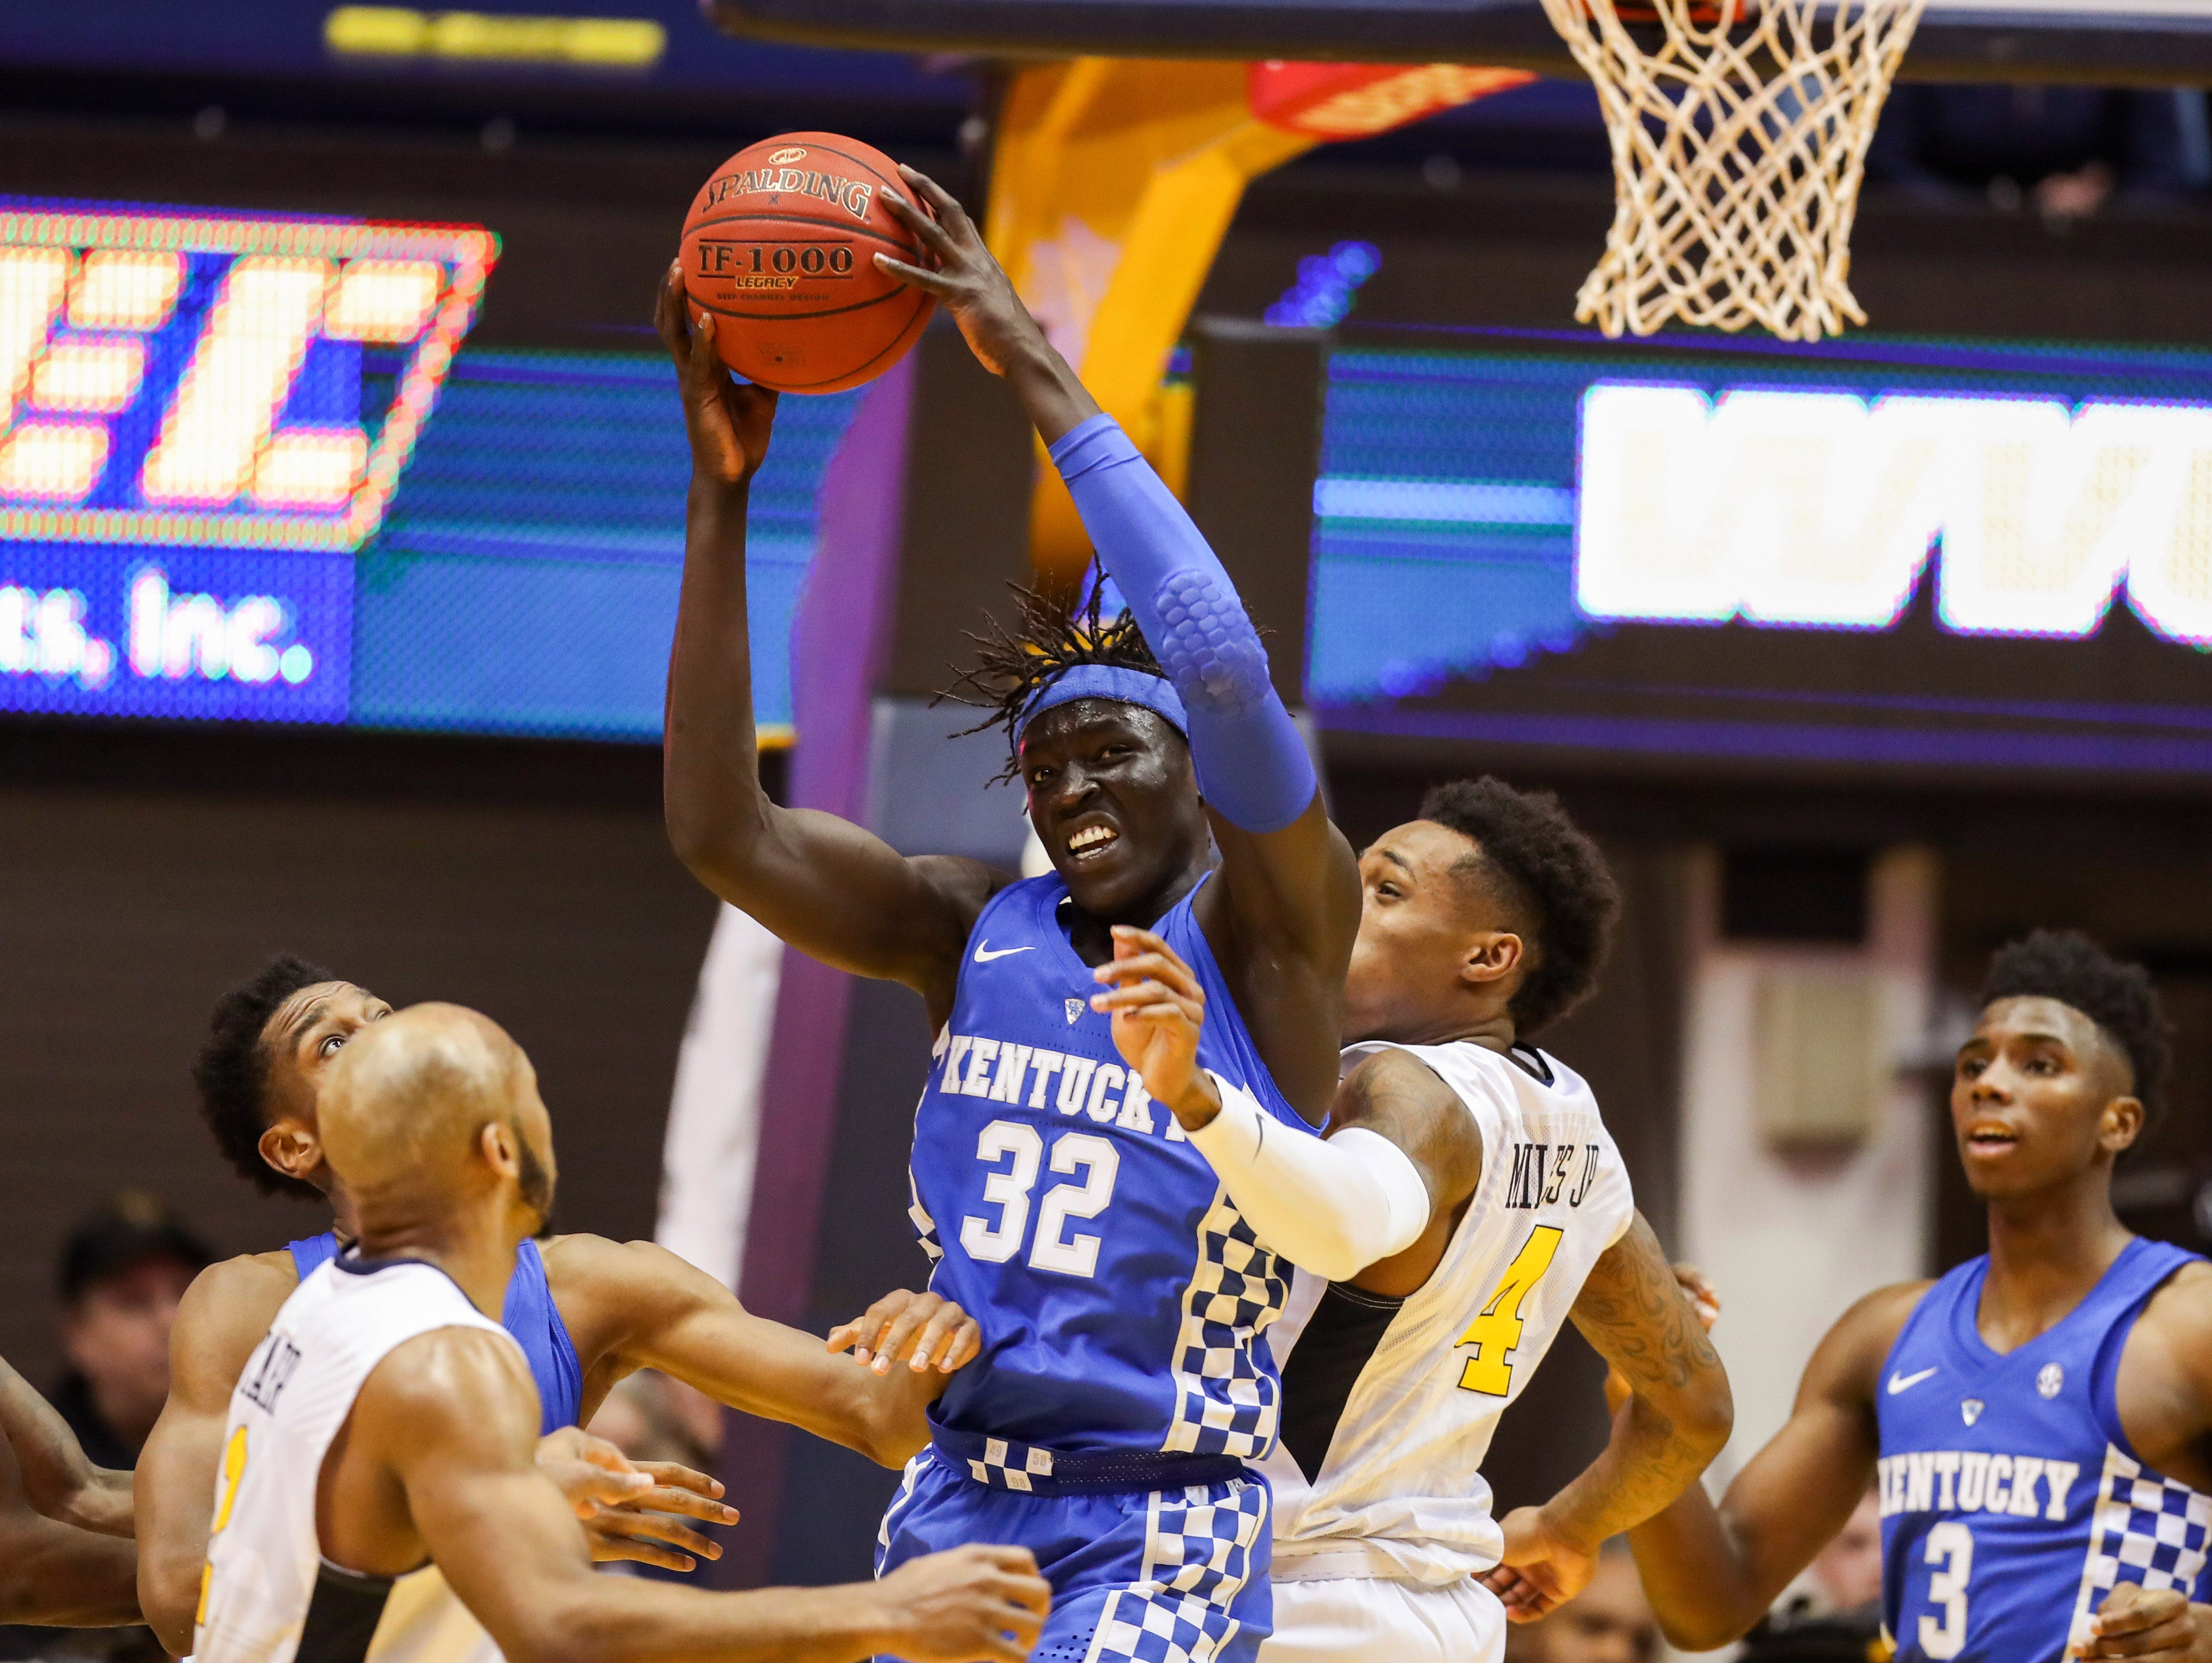 Uk Basketball: How To Watch Kentucky Basketball At Auburn: Game Time, TV